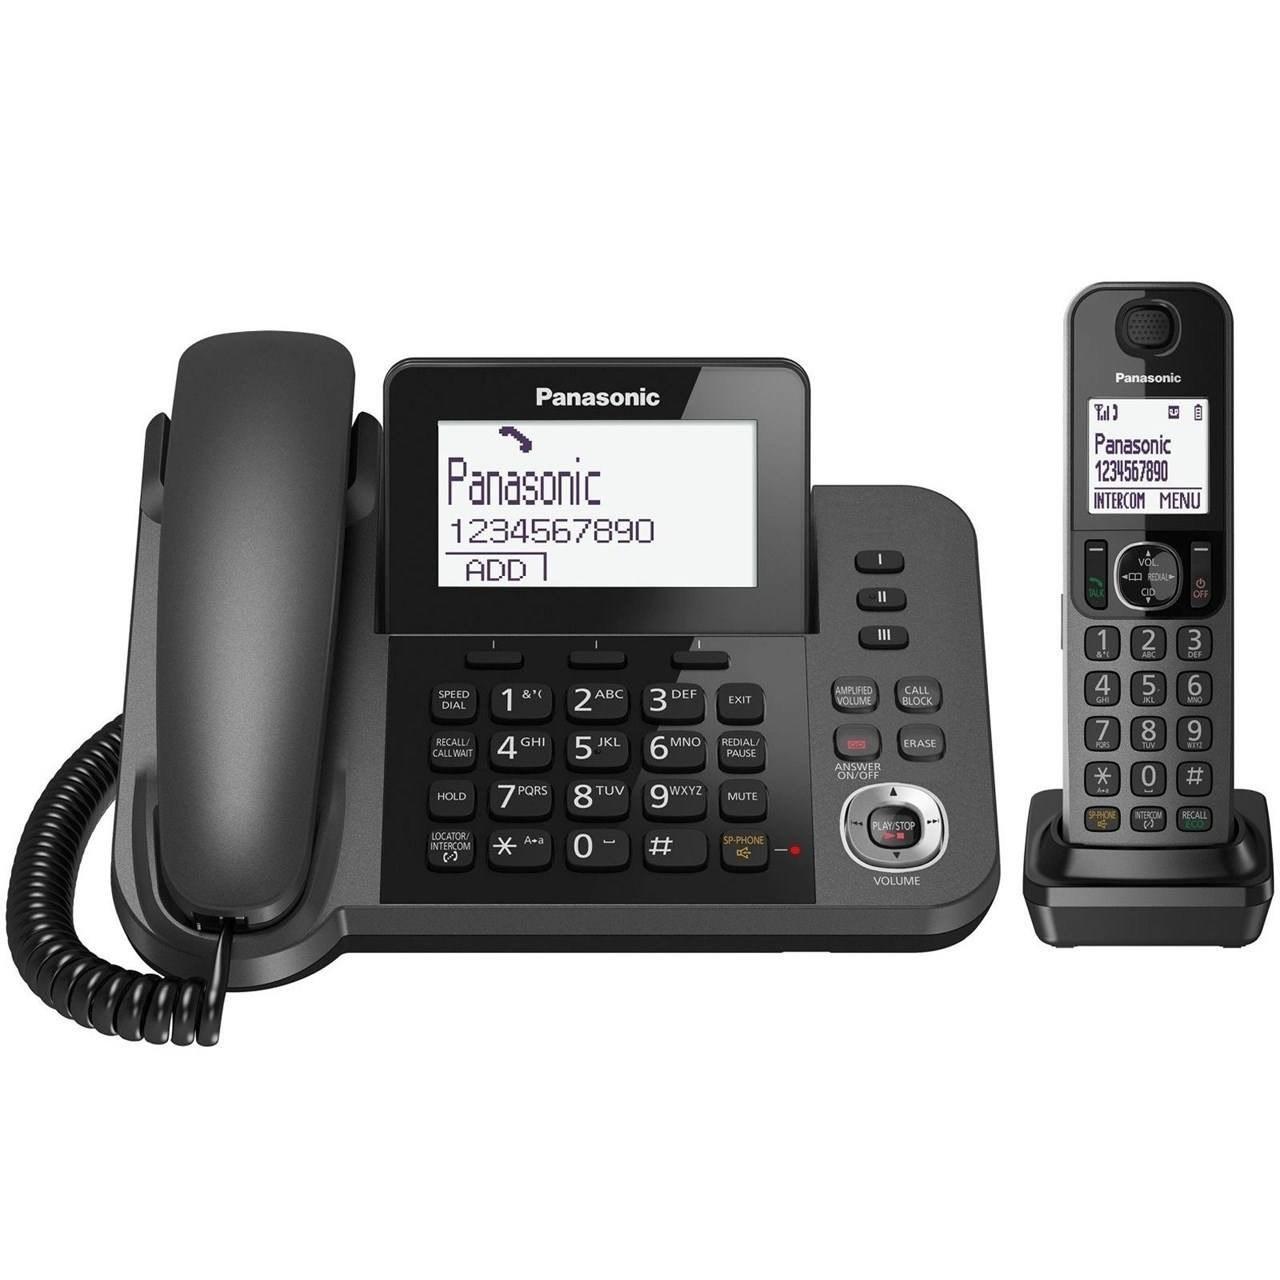 عکس گوشی تلفن ثابت و بی سیم  پاناسونیک Corded-Cordless Combo Telephone KX-TGF320JX گوشی-تلفن-ثابت-و-بی-سیم-پاناسونیک